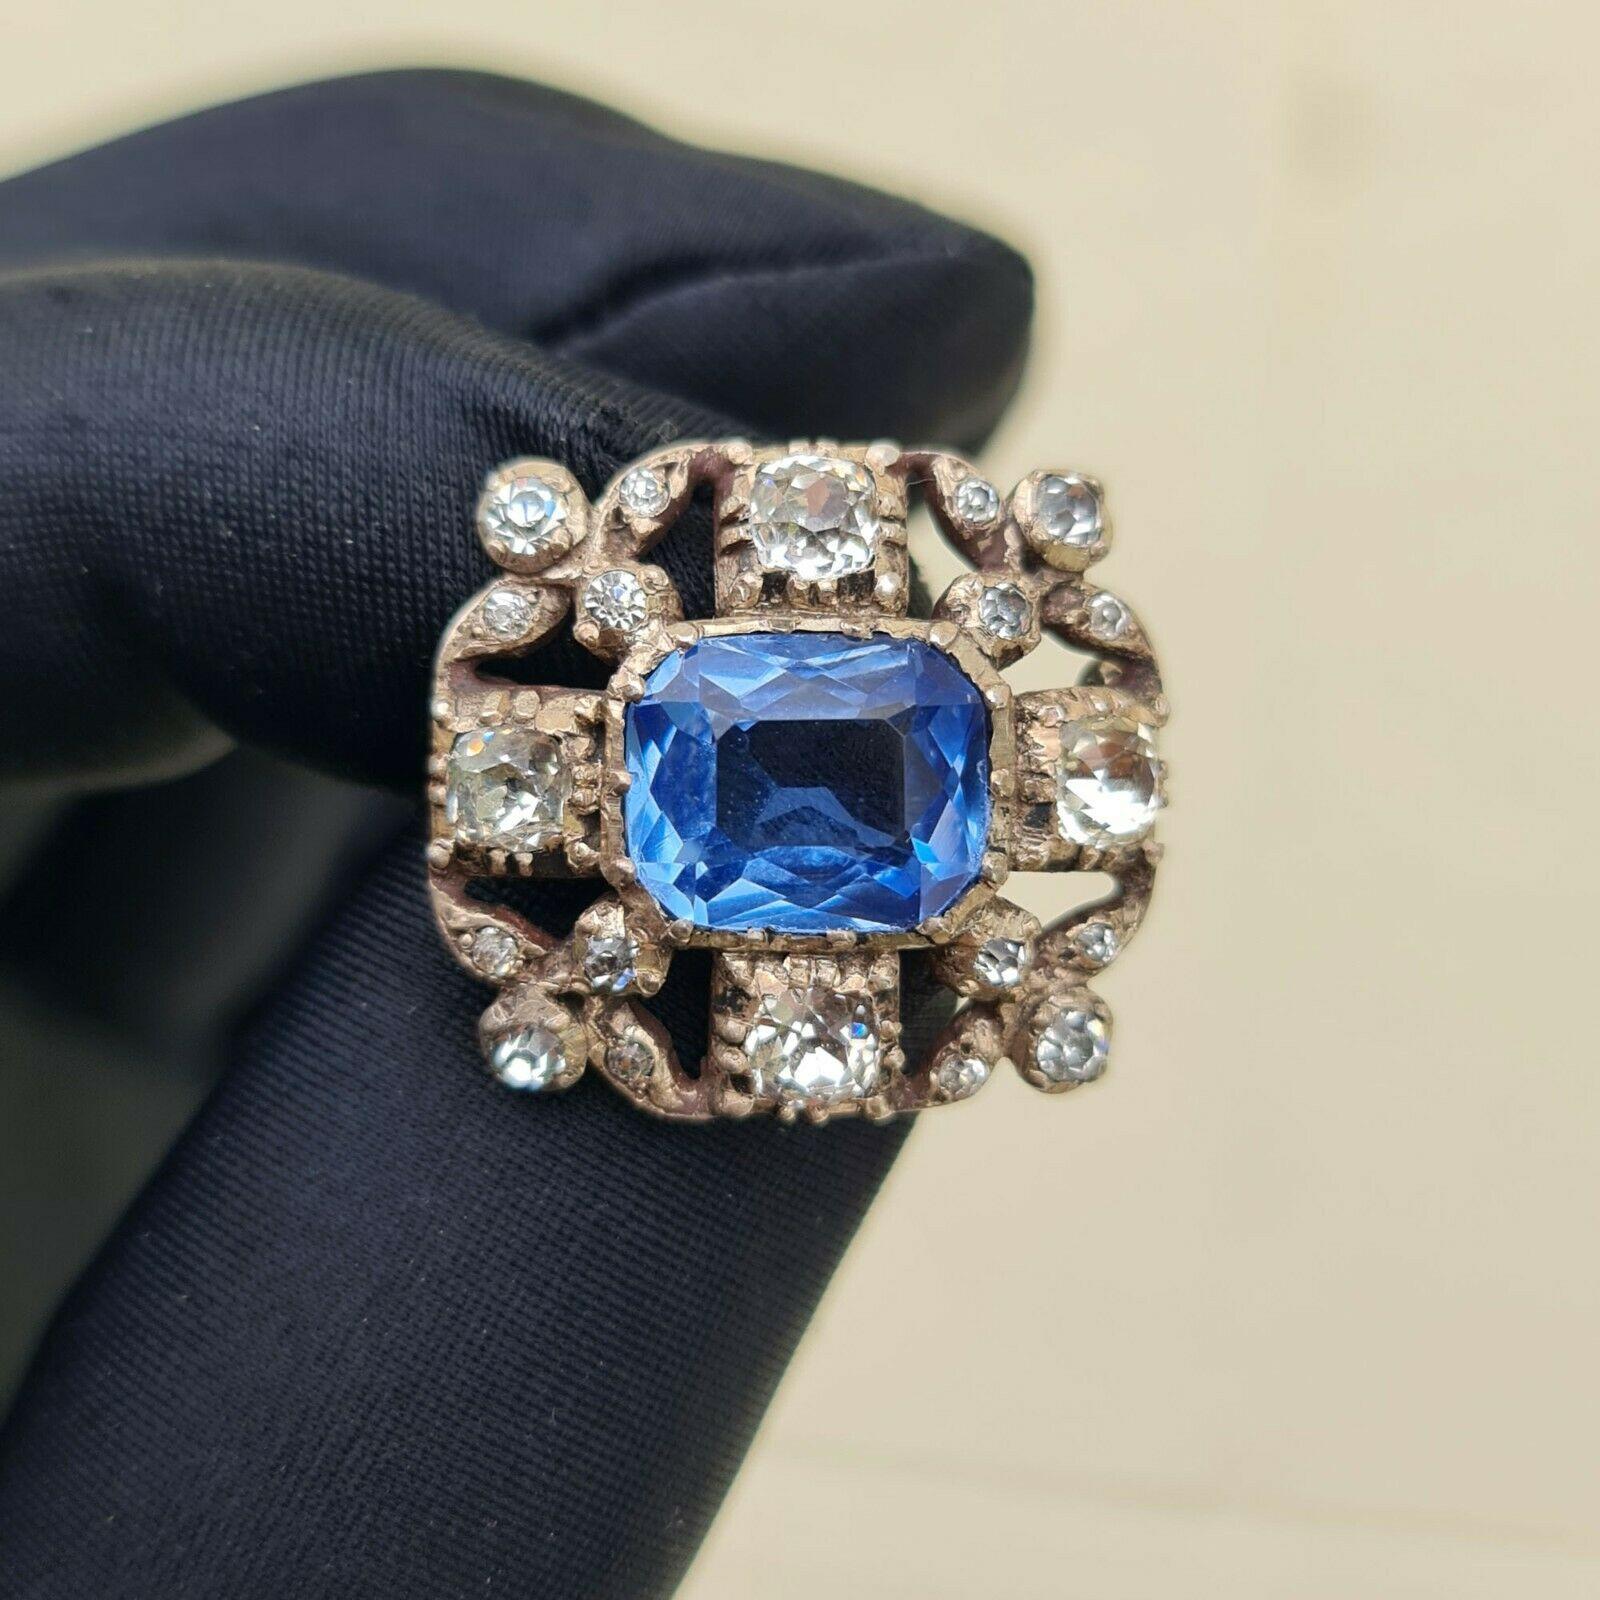 Antique, Georgian Silver, black dot paste & blue glass brooch, pin, Circa 1800